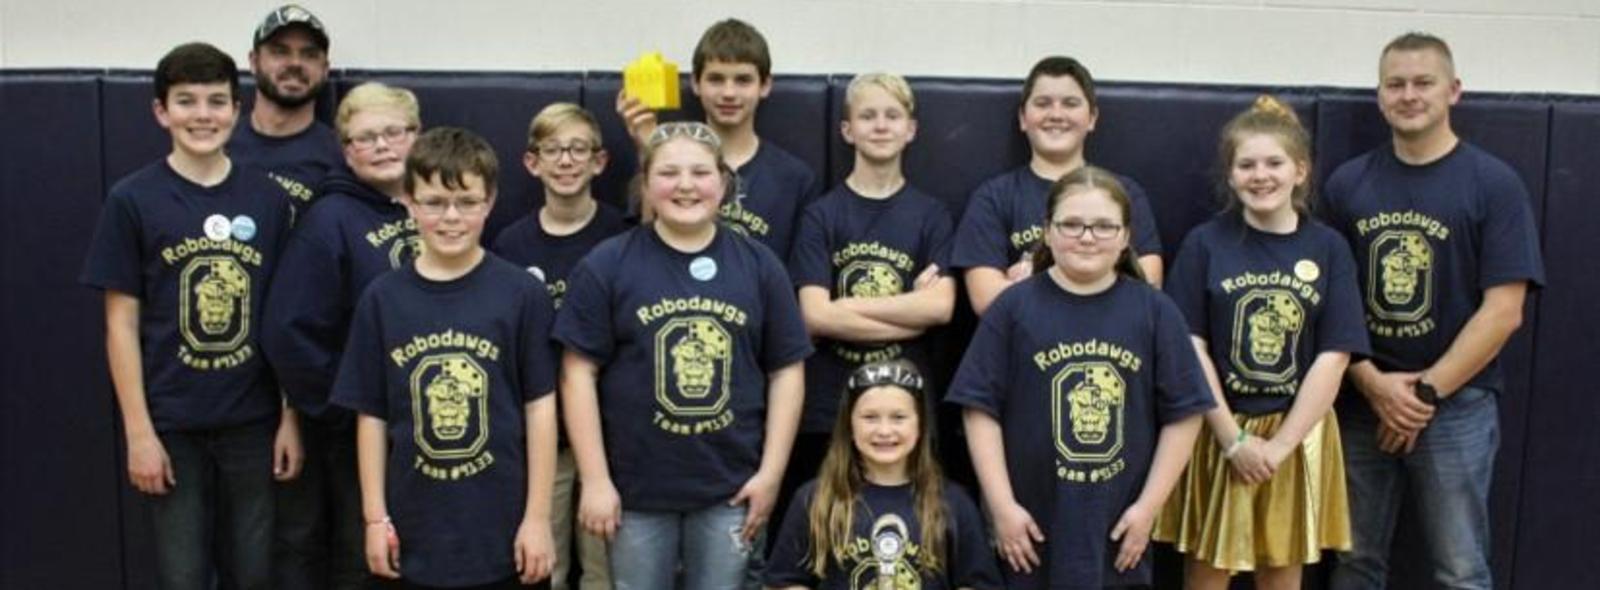 Robodawgs robotics team